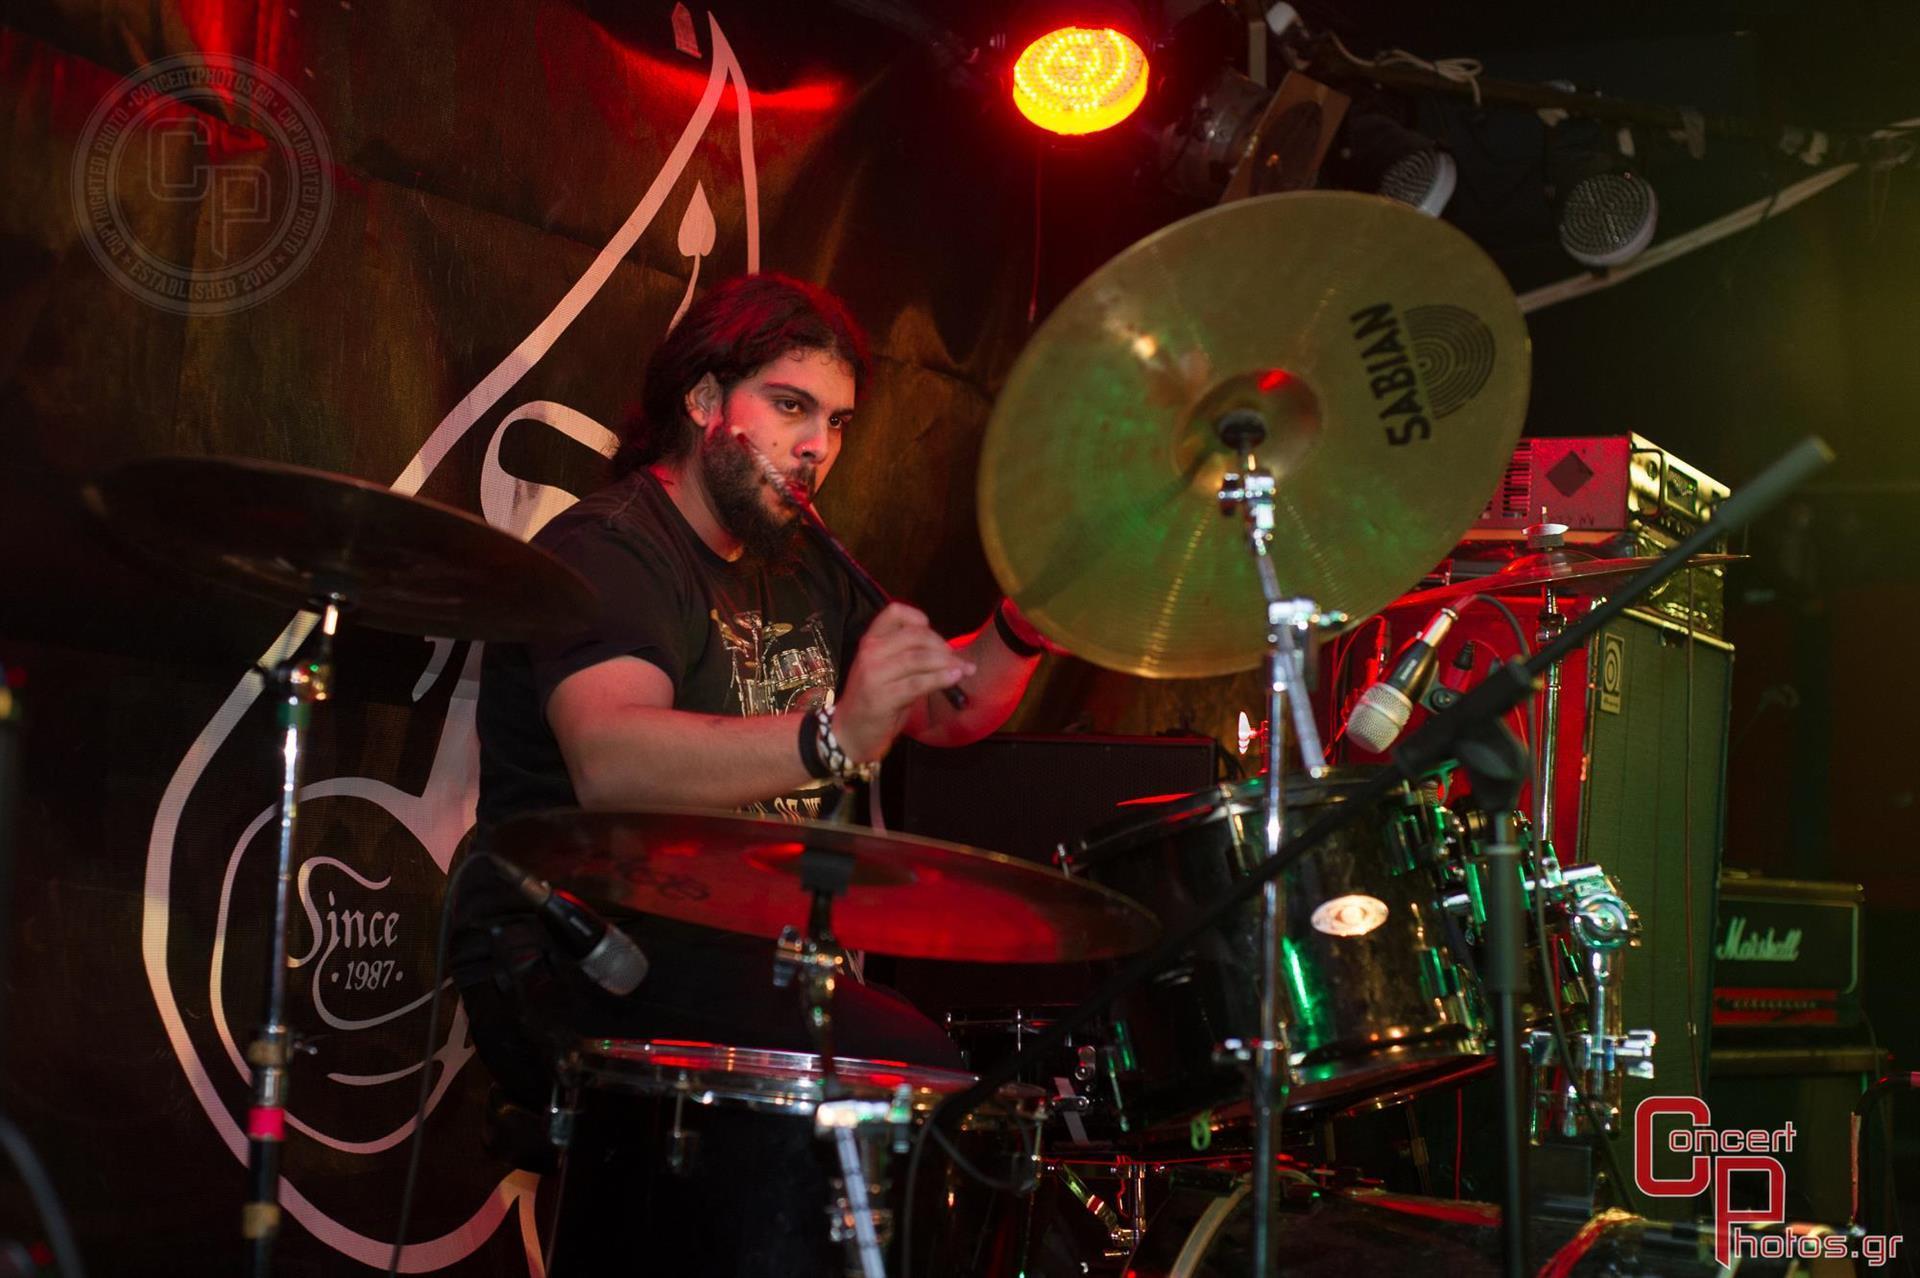 Battle Of The Bands Athens - Leg 3- photographer:  - ConcertPhotos - 20150105_0007_53